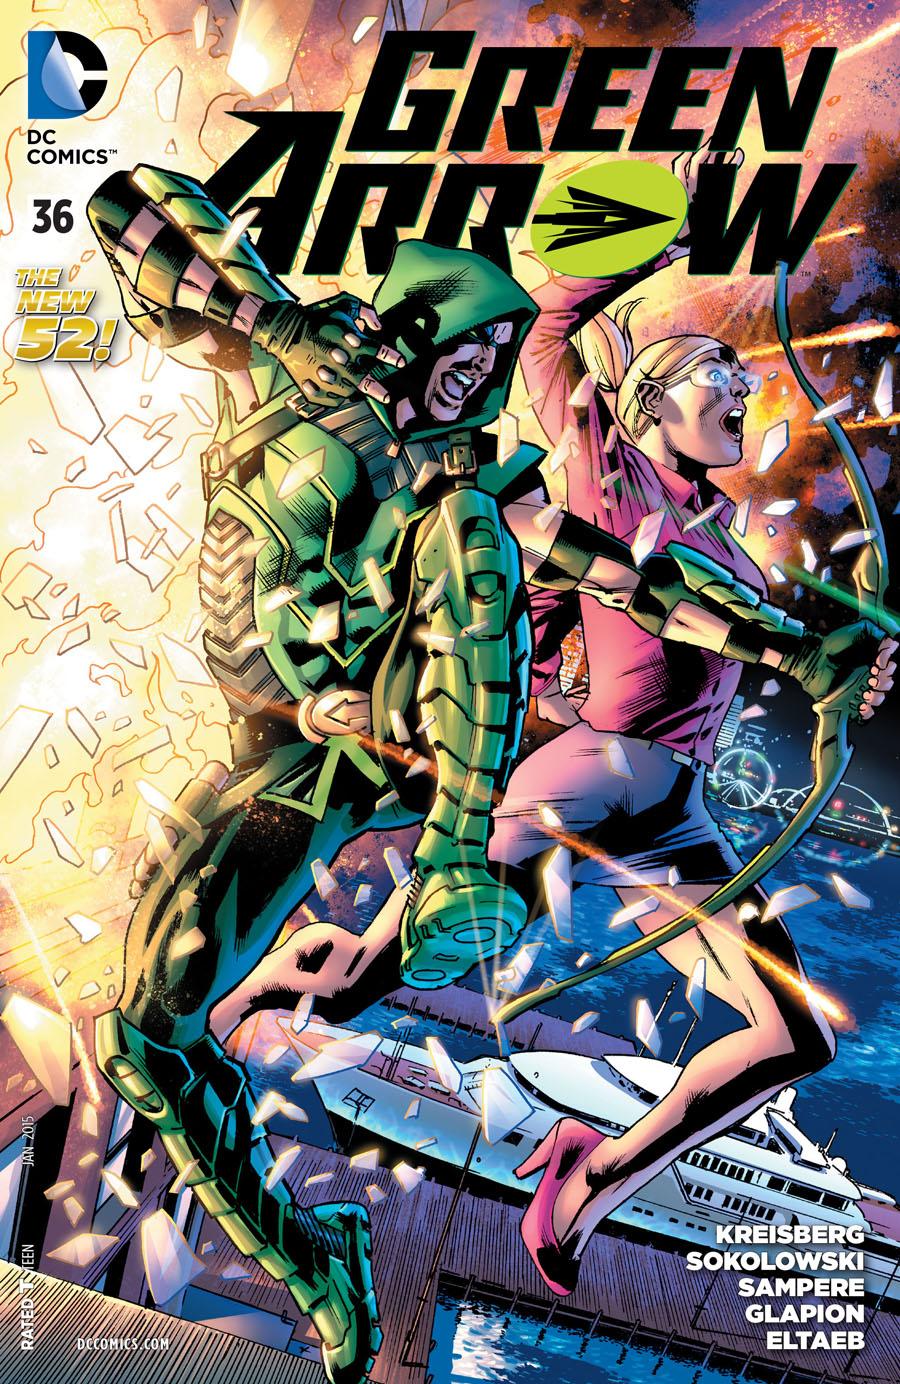 [Comics] Tapas Temáticas de Comics v1 - Página 4 Green-arrow2